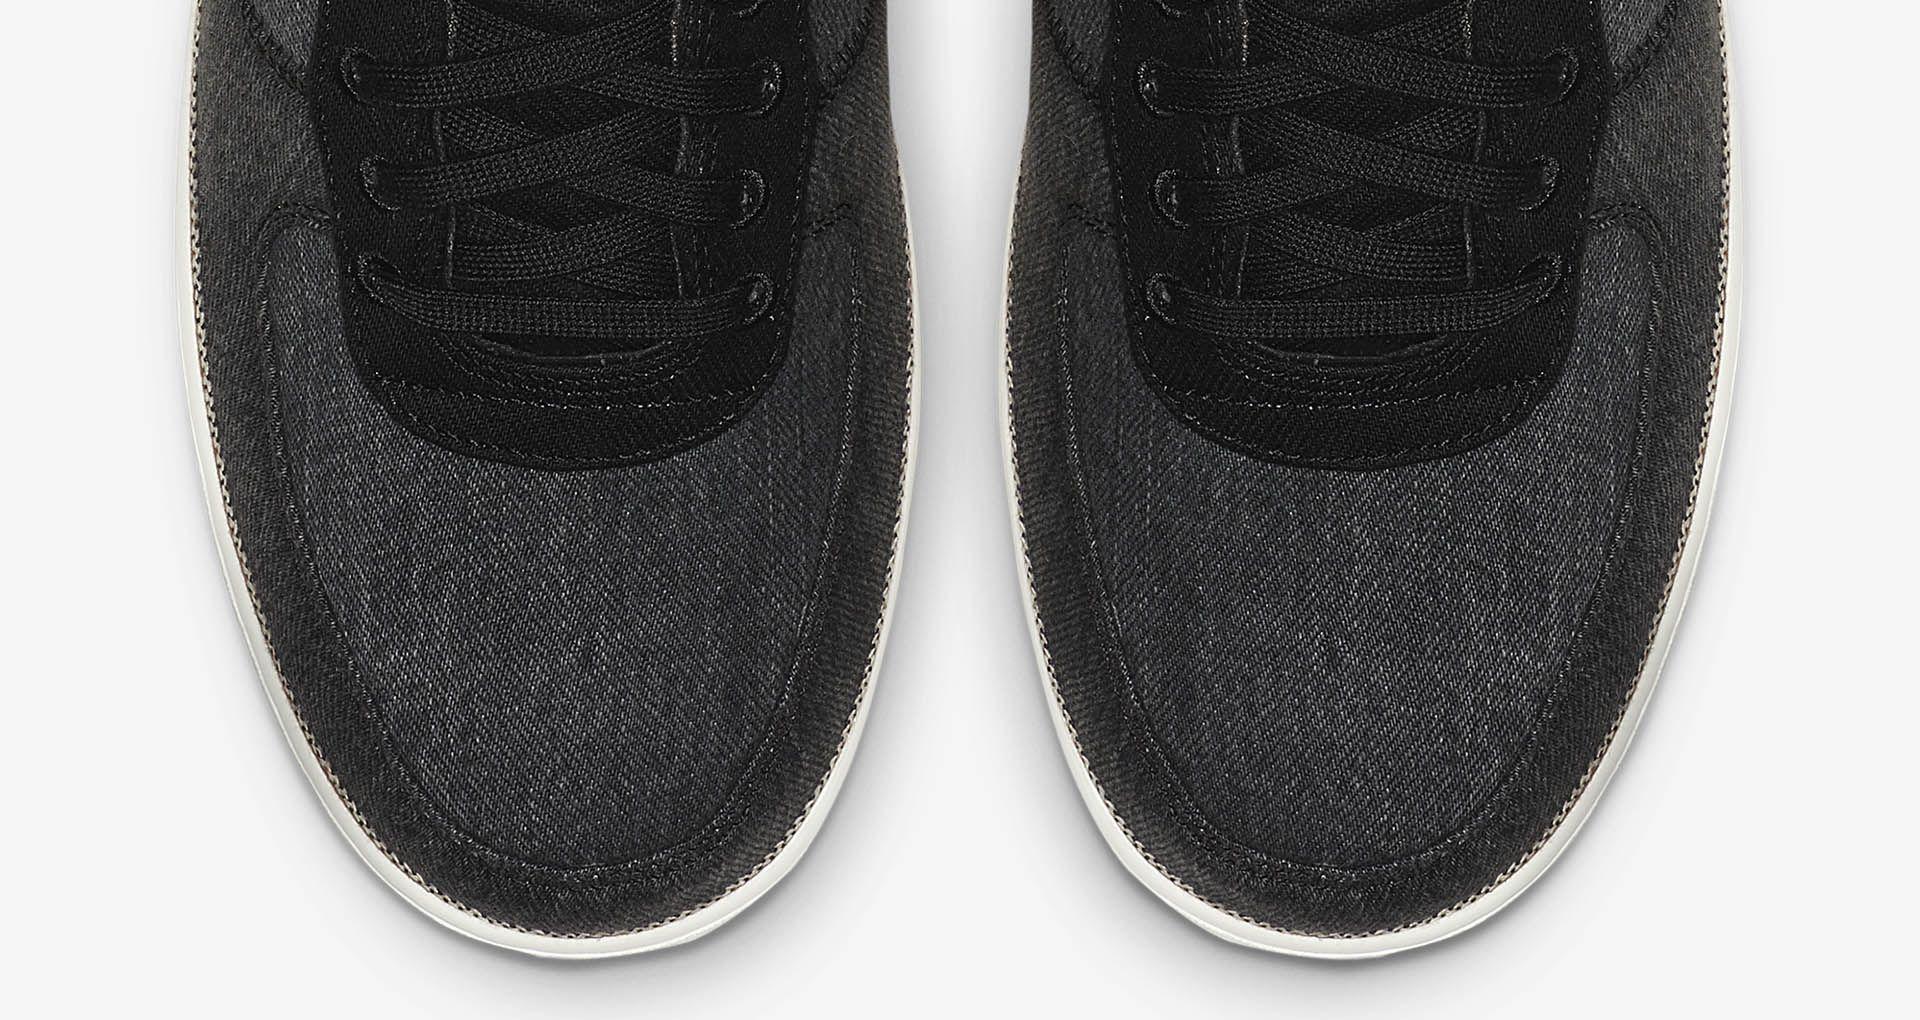 3x1 x Air Force 1 'Black Denim' Release Date. Nike SNKRS